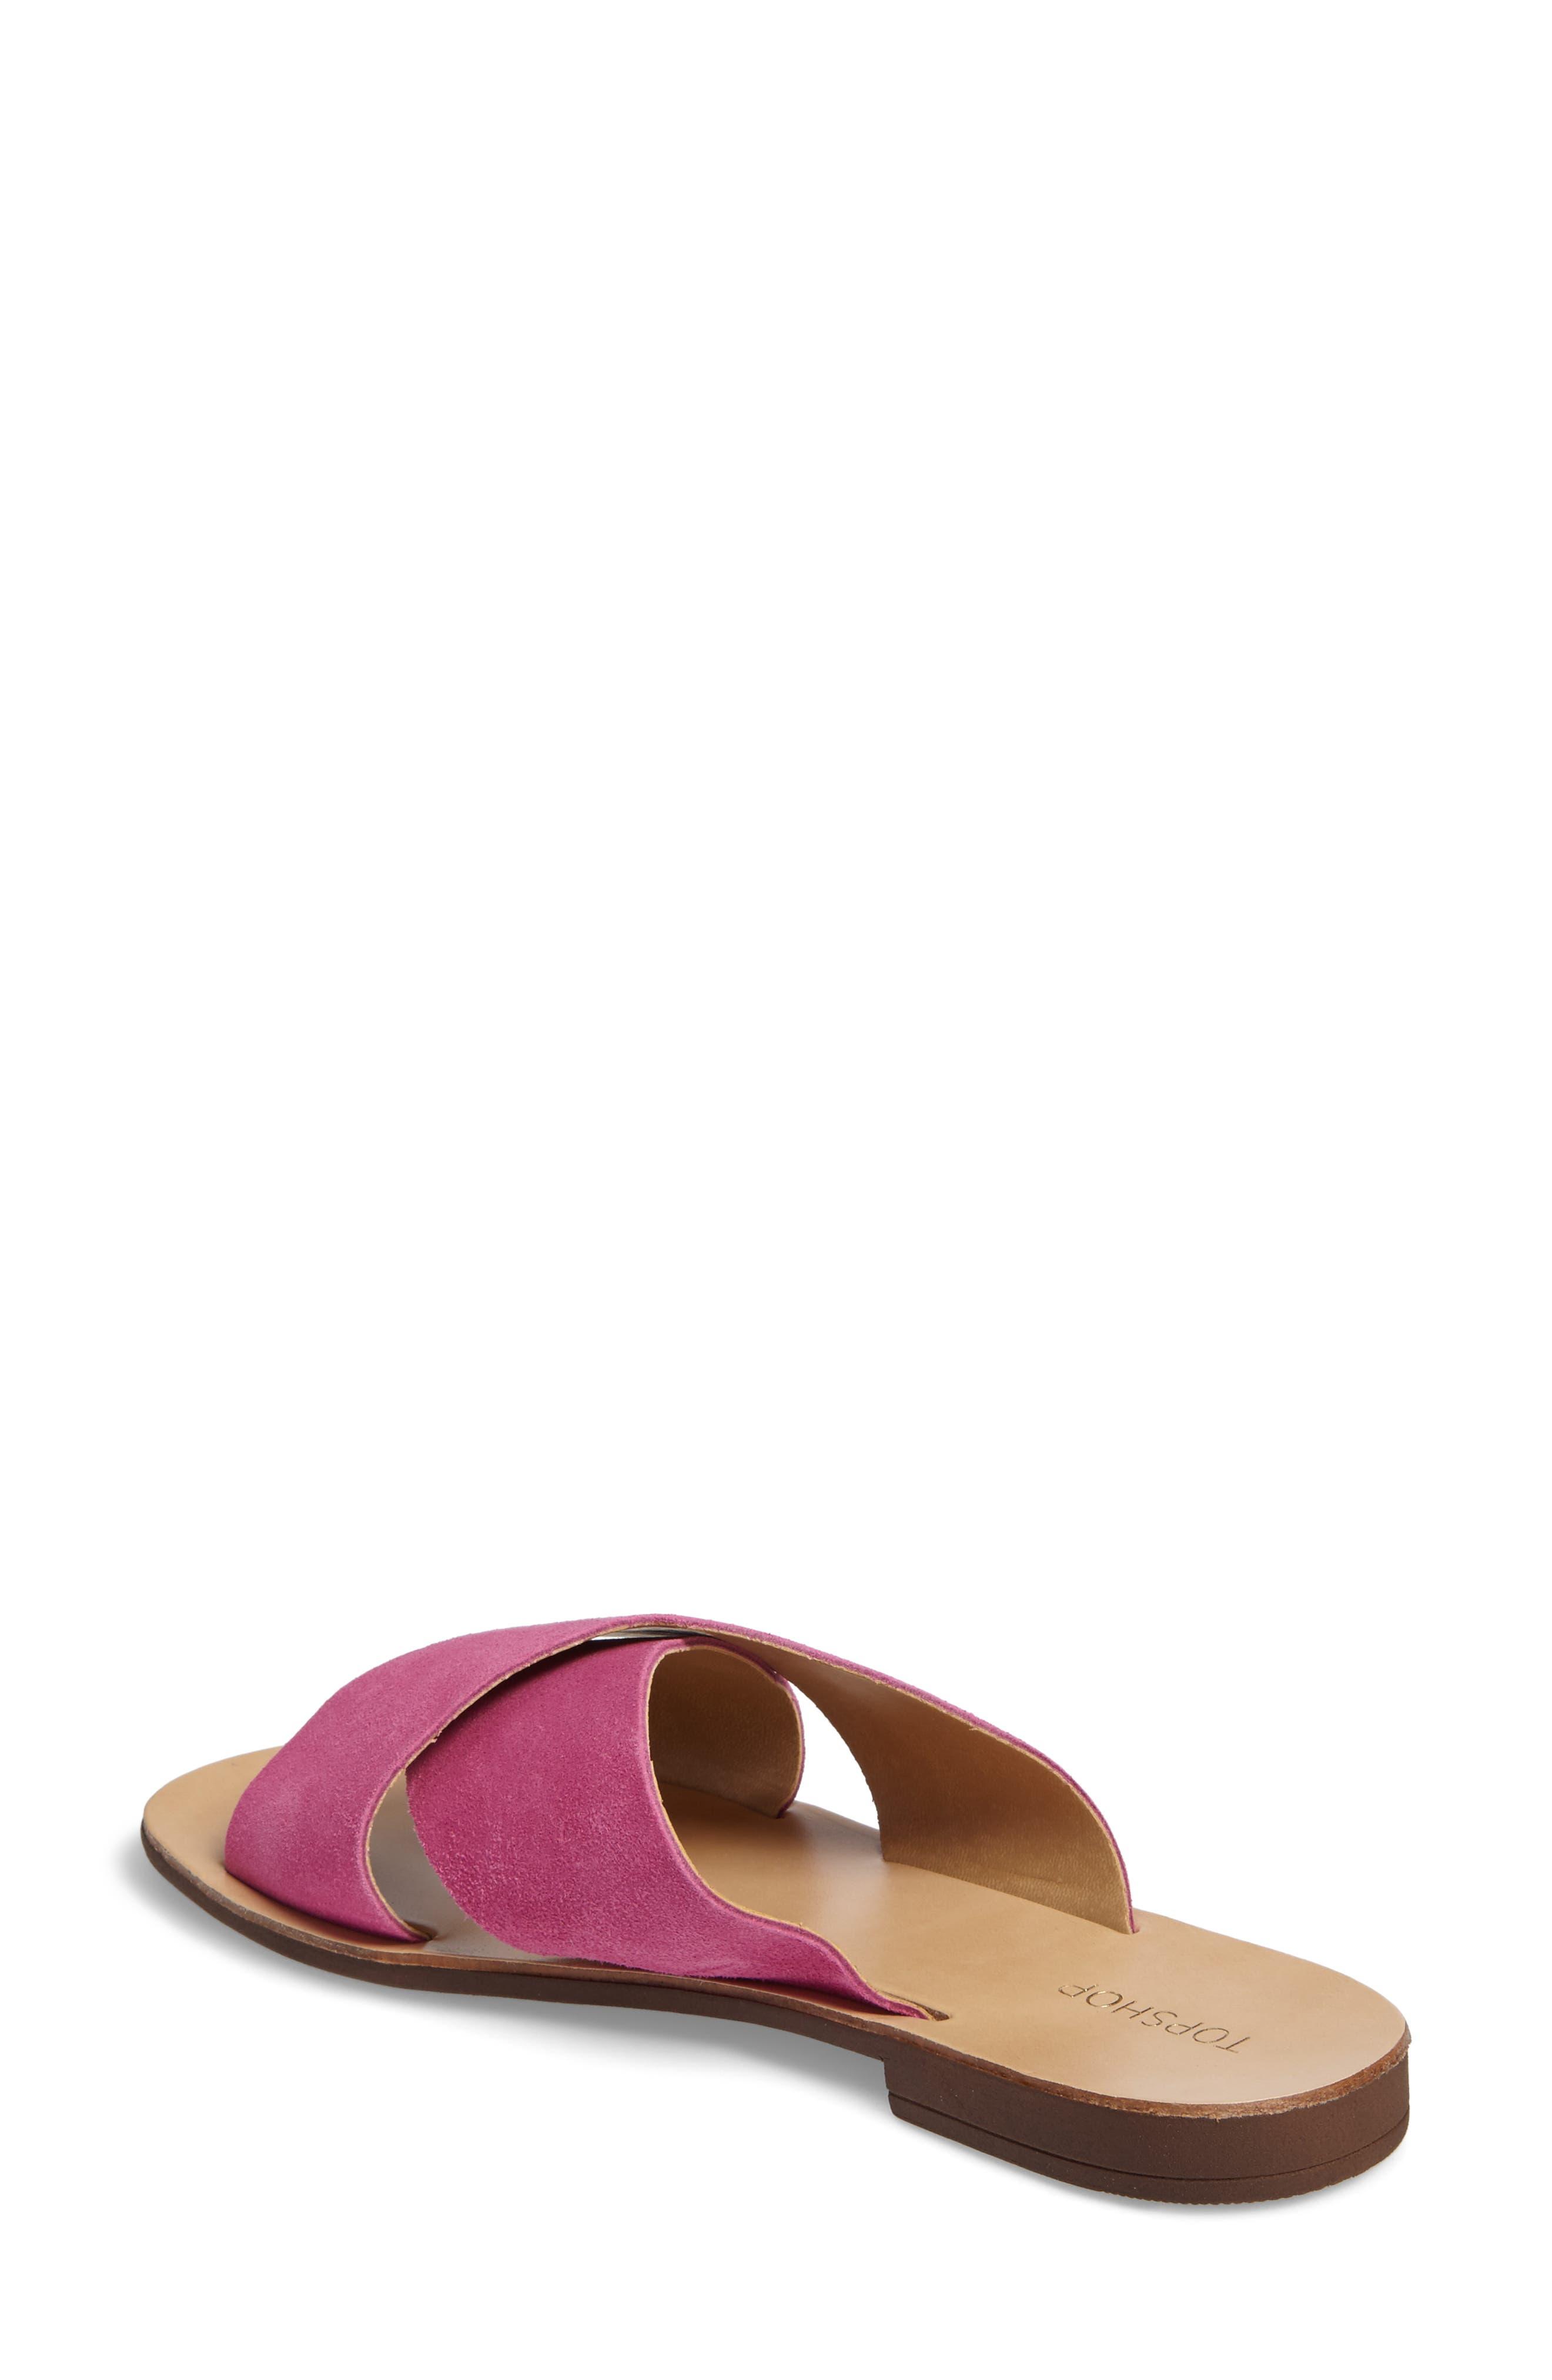 Hawaii Crisscross Sandal,                             Alternate thumbnail 14, color,